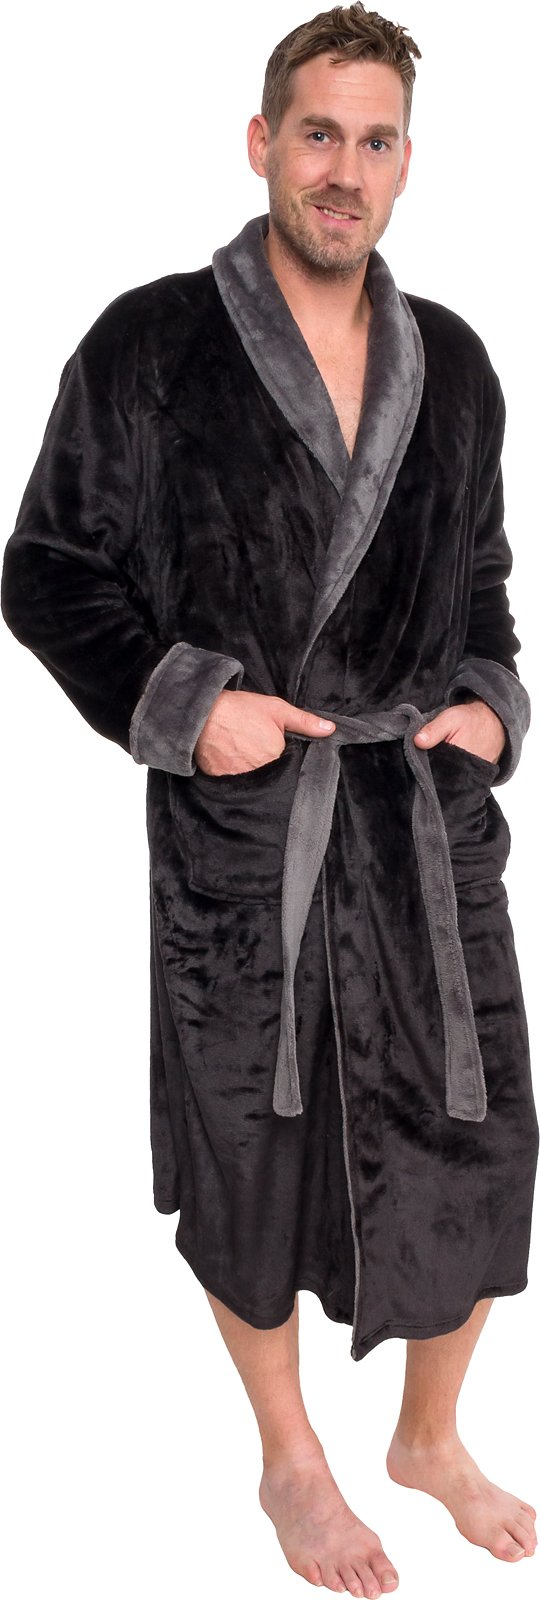 Ross Michaels Mens Plush Shawl Collar Kimono Bathrobe Robe (Black & Grey, S/M)